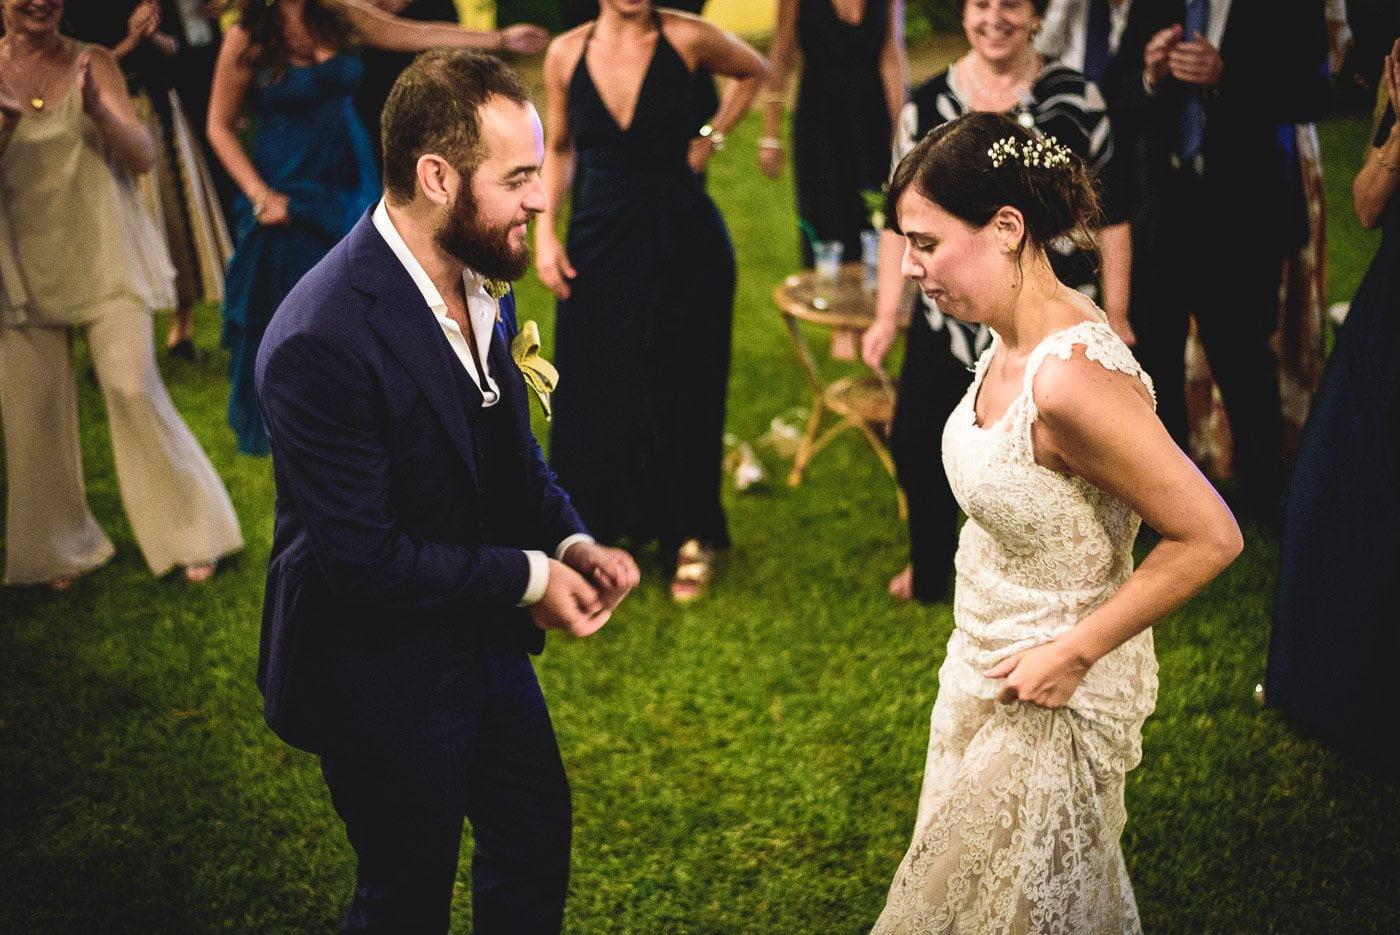 Matrimonio Giulia & Federico 09_15 – Alessio Nobili Photographer-57